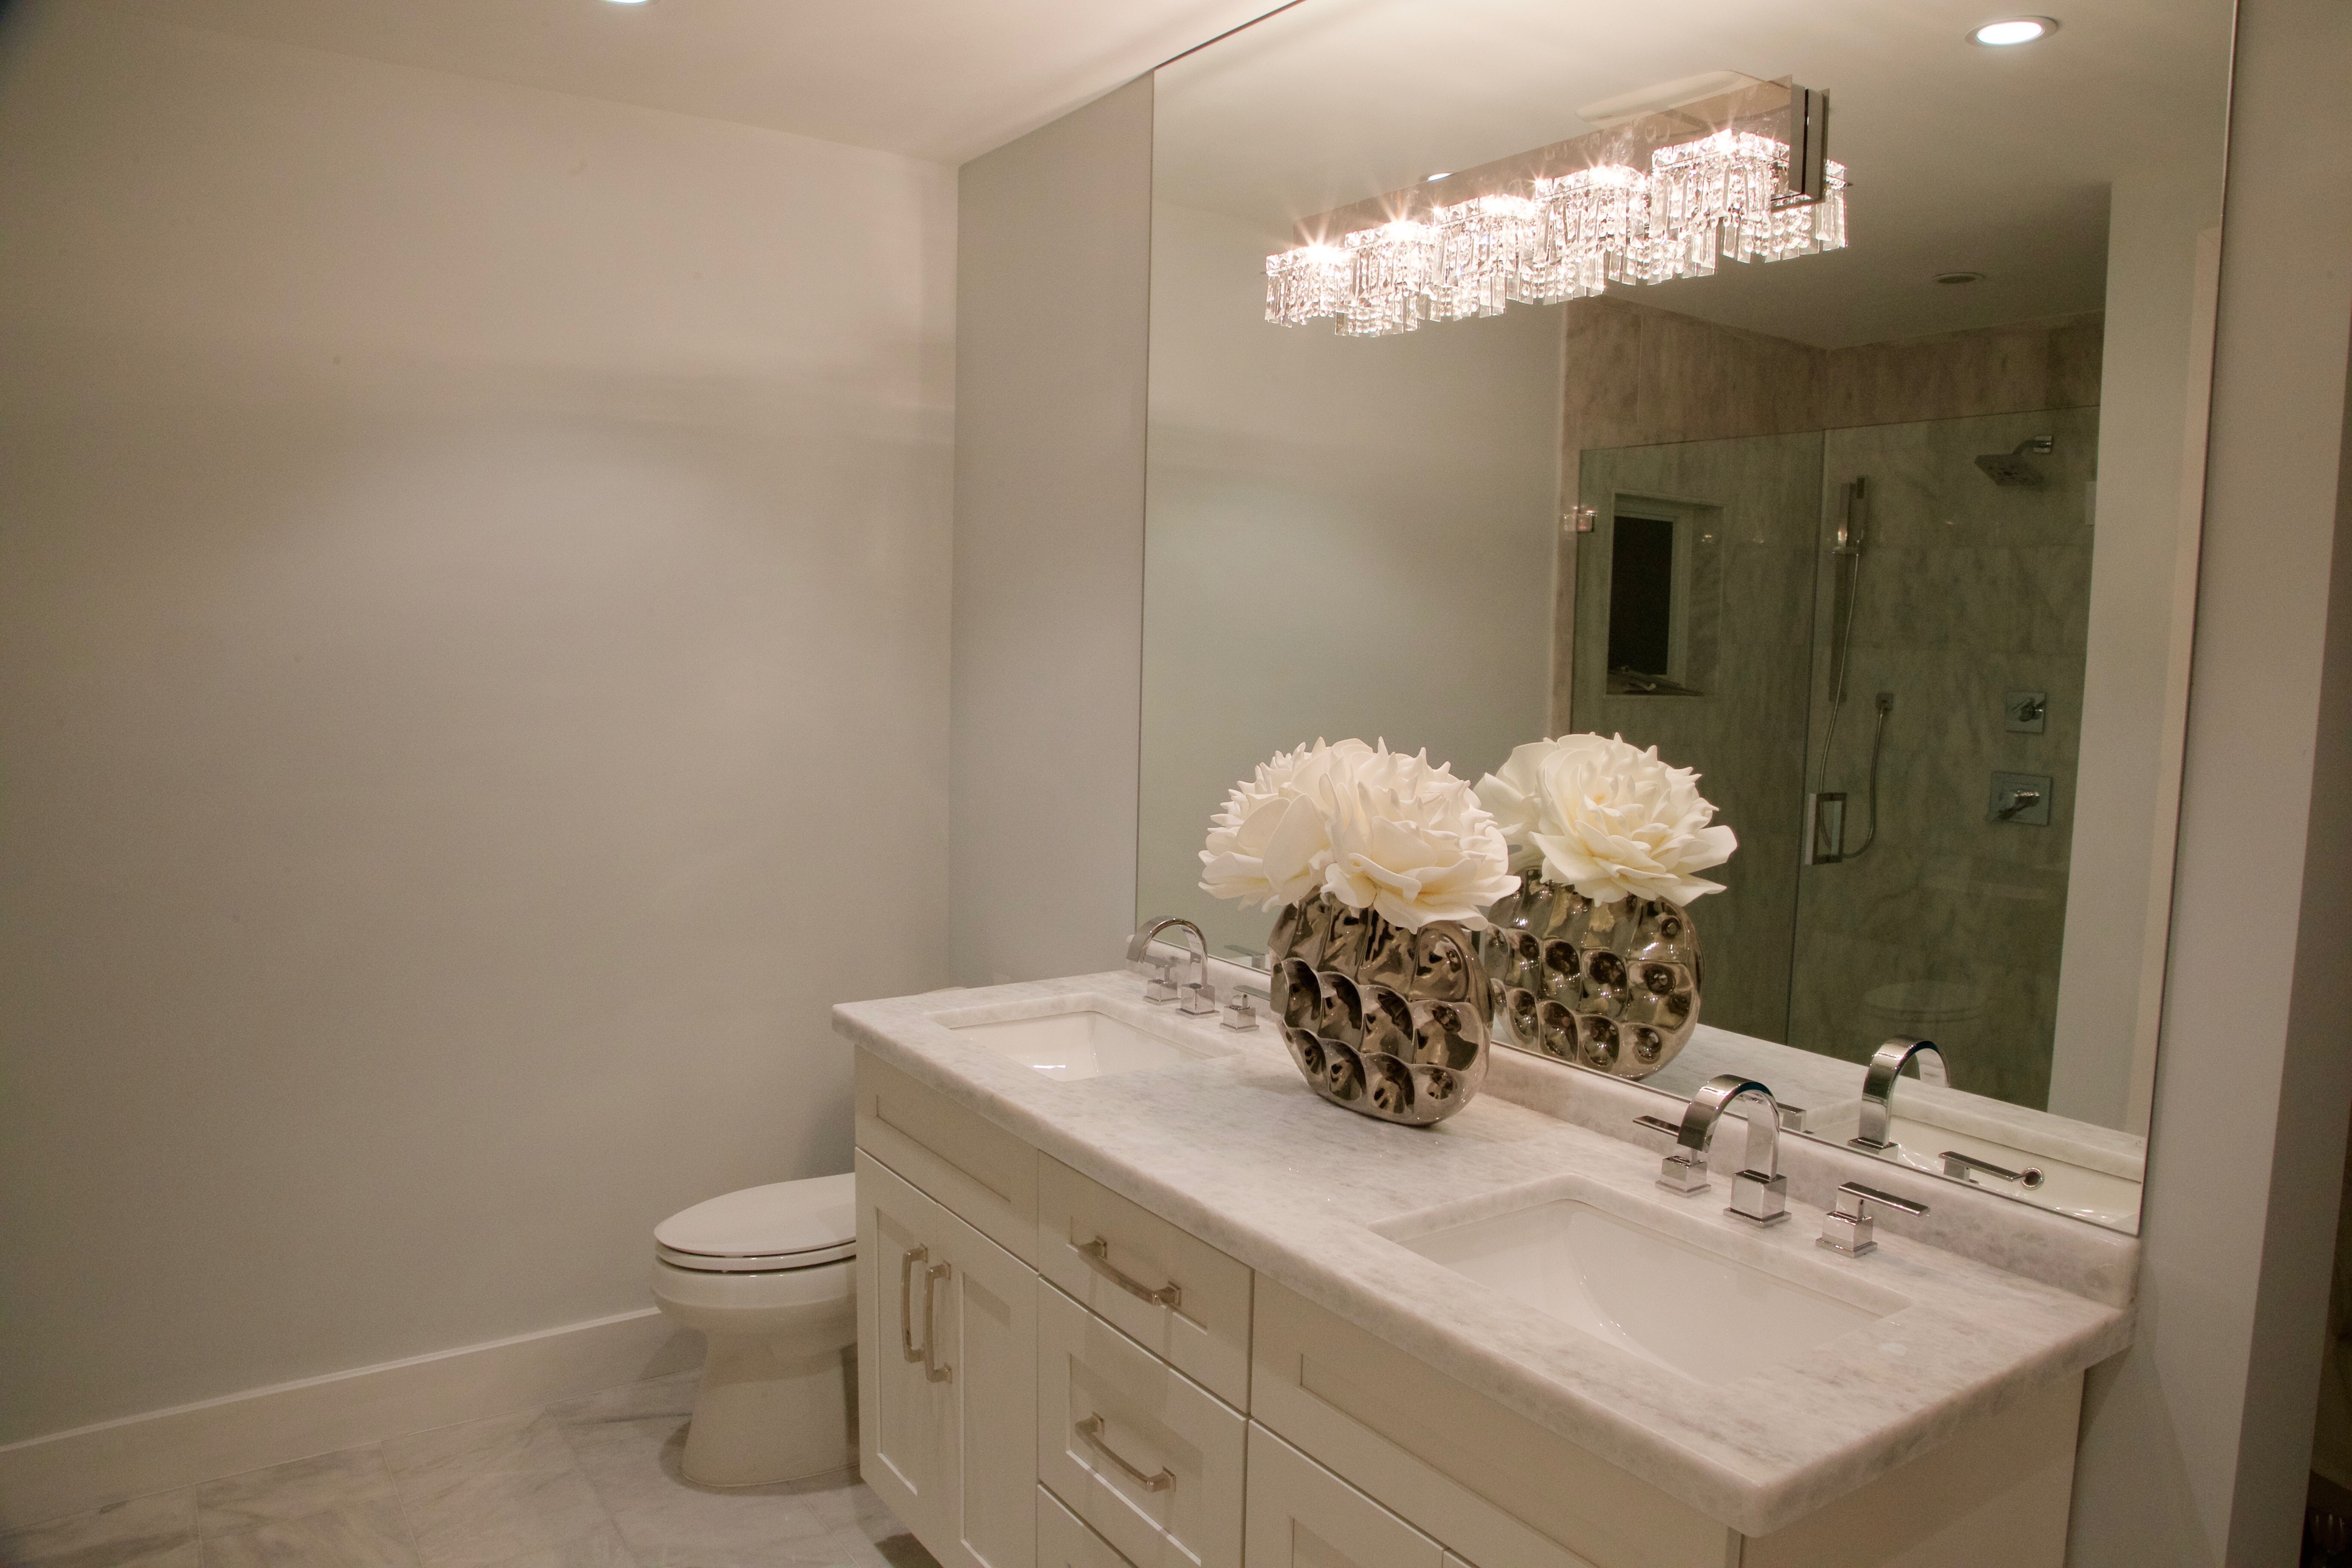 Bathroom remodeling for Venetian plaster bathroom ideas